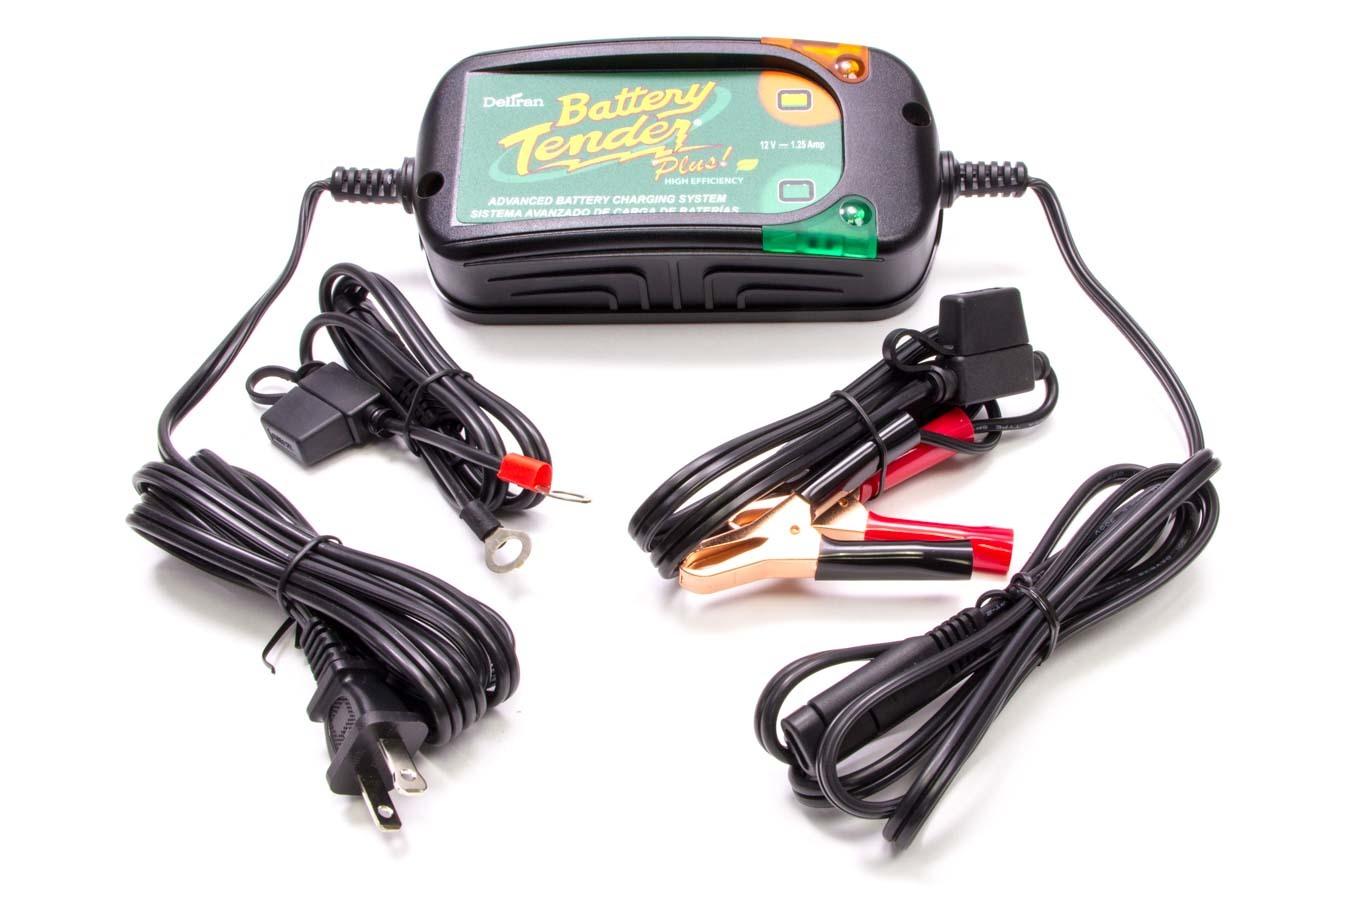 12 Volt Battery Tender Plus California Approved